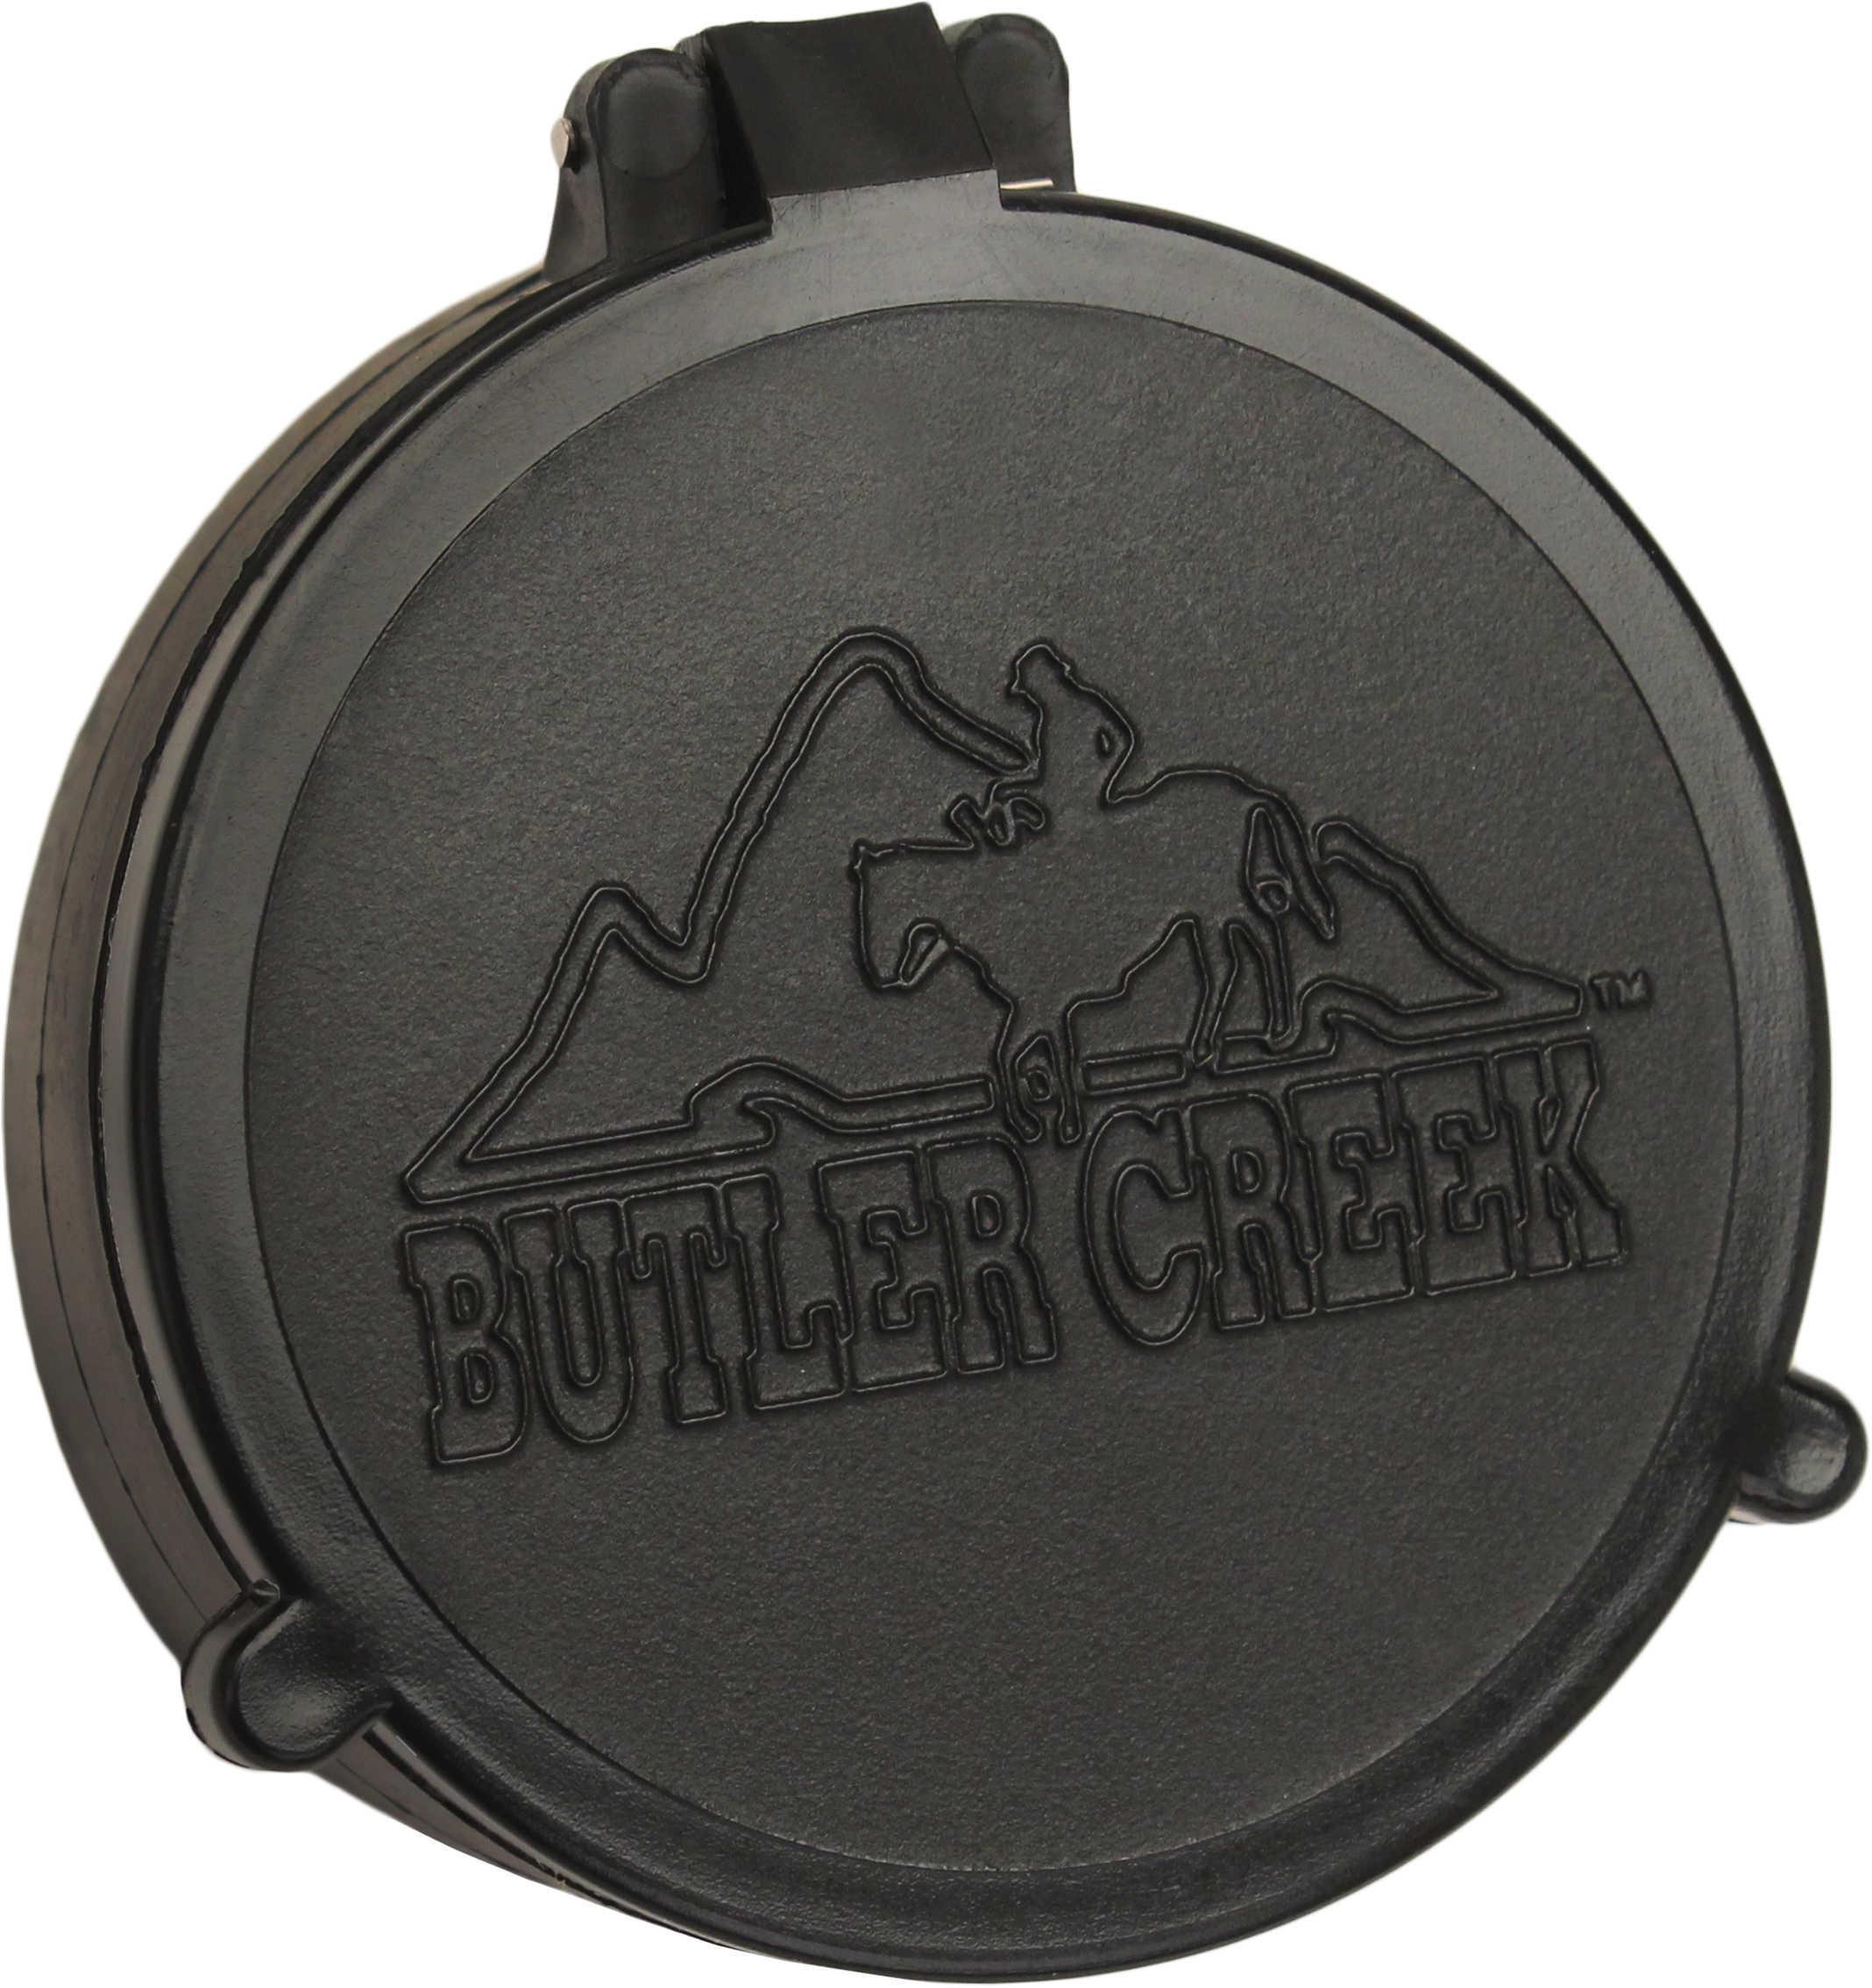 Butler Creek Flip Open Scope Cover - Objective Size 48 Md: 30480